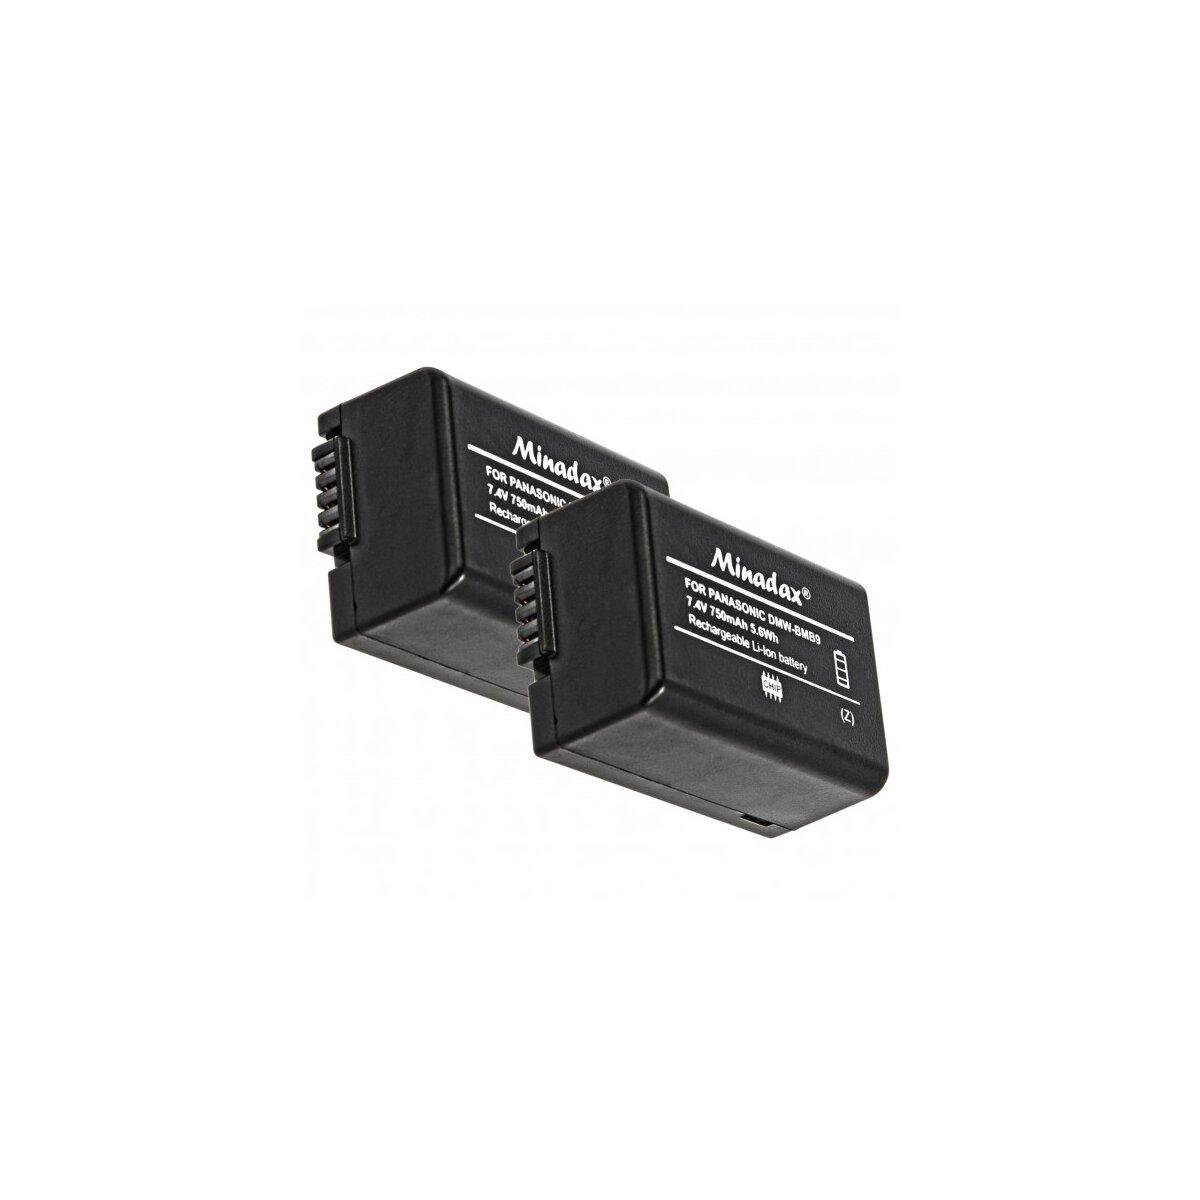 2x Minadax® Qualitaetsakku mit echten 750 mAh fuer Panasonic Lumix DMC FZ72 FZ62 FZ45 FZ48 FZ100 FZ150, wie DMW BMB9 - Intelligentes Akkusystem mit Chip